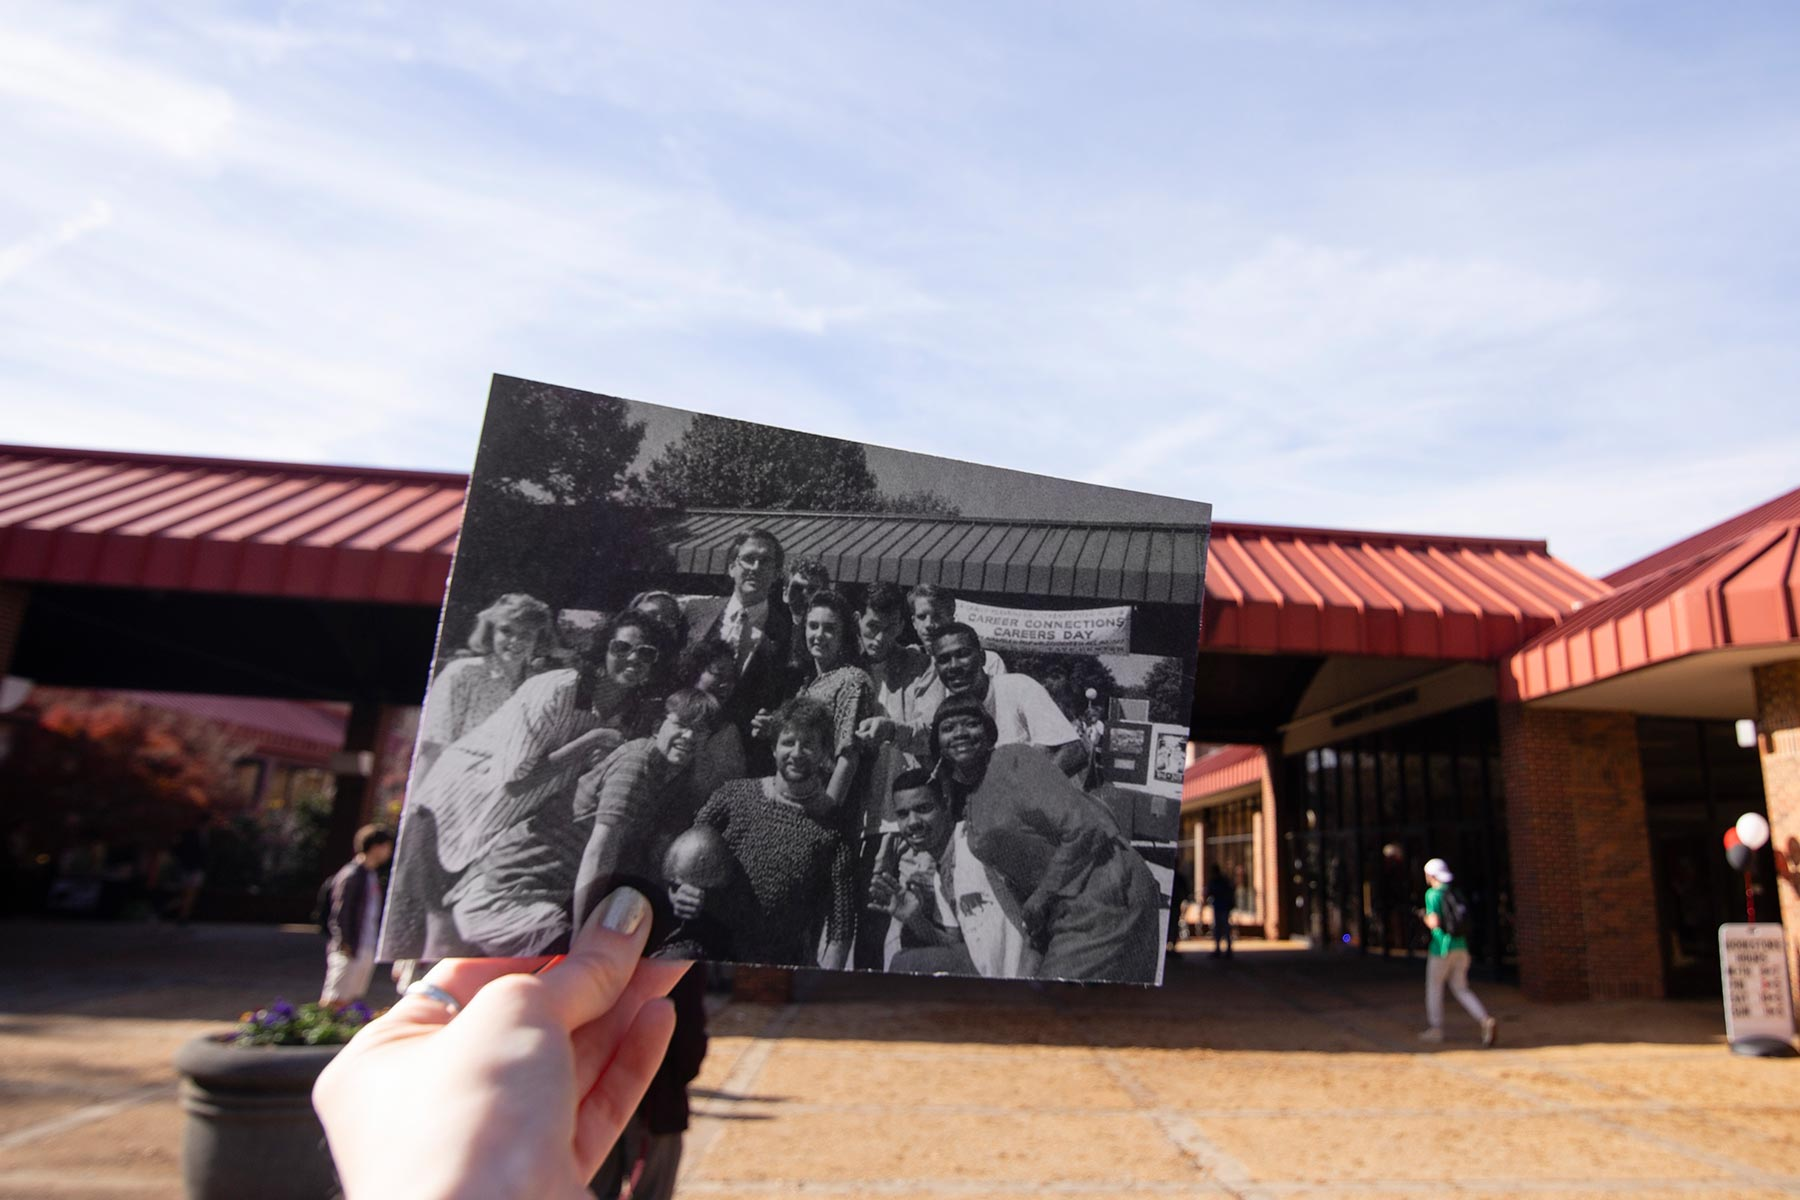 Tate Center photo overlay